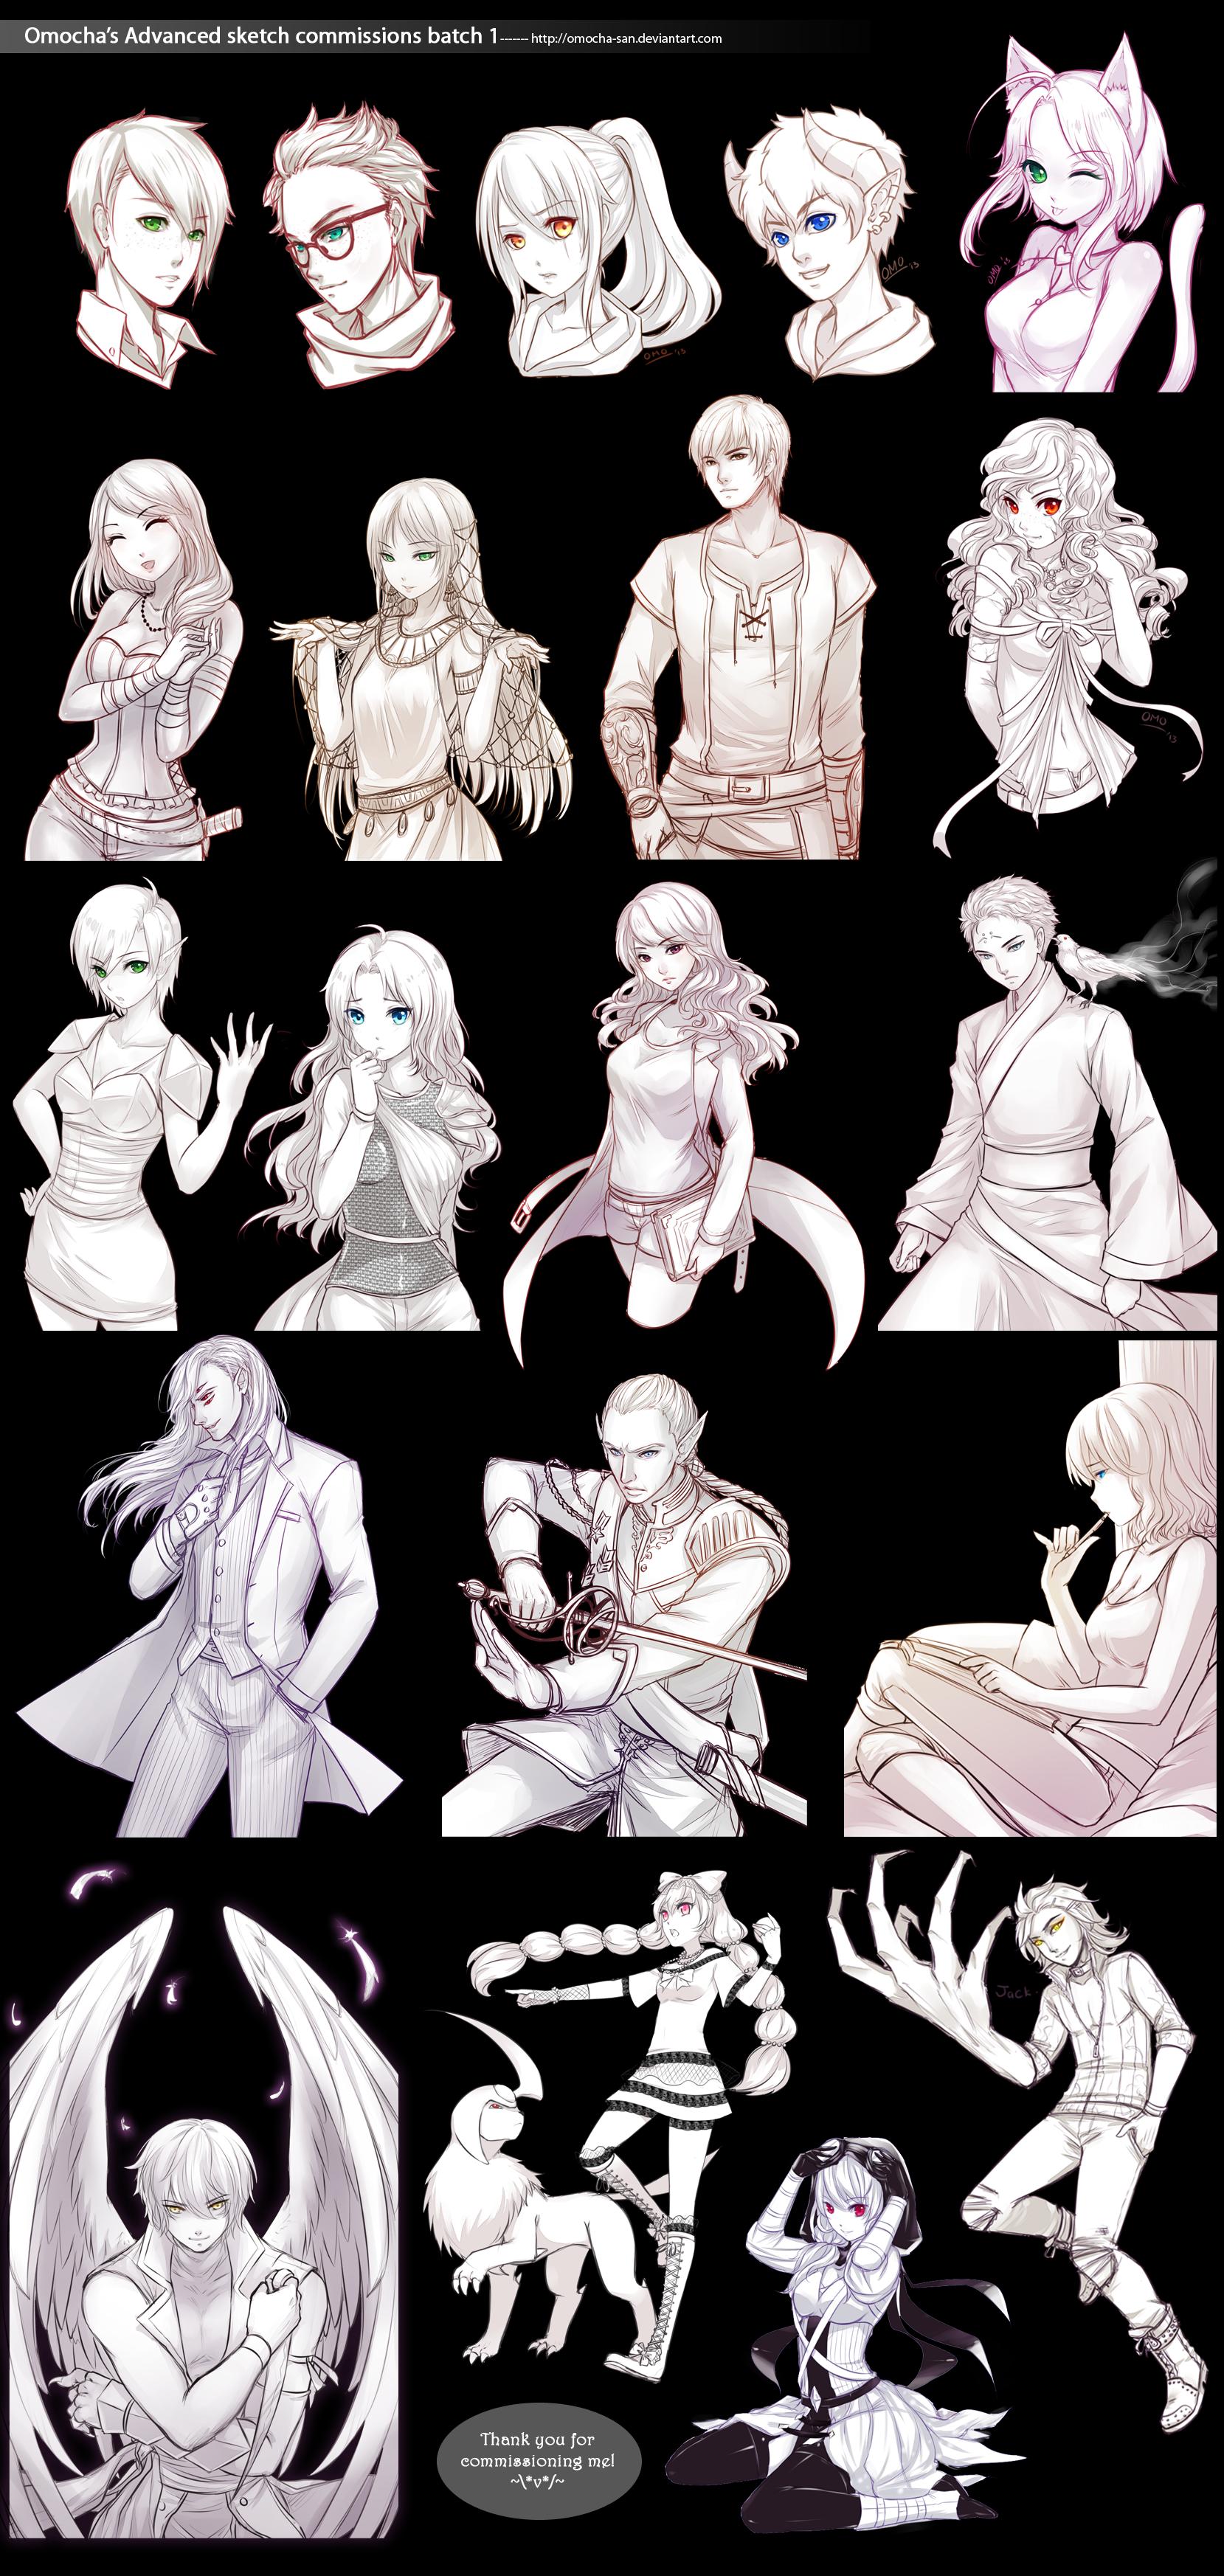 Commission: Advanced sketch batch 1 by ZenithOmocha